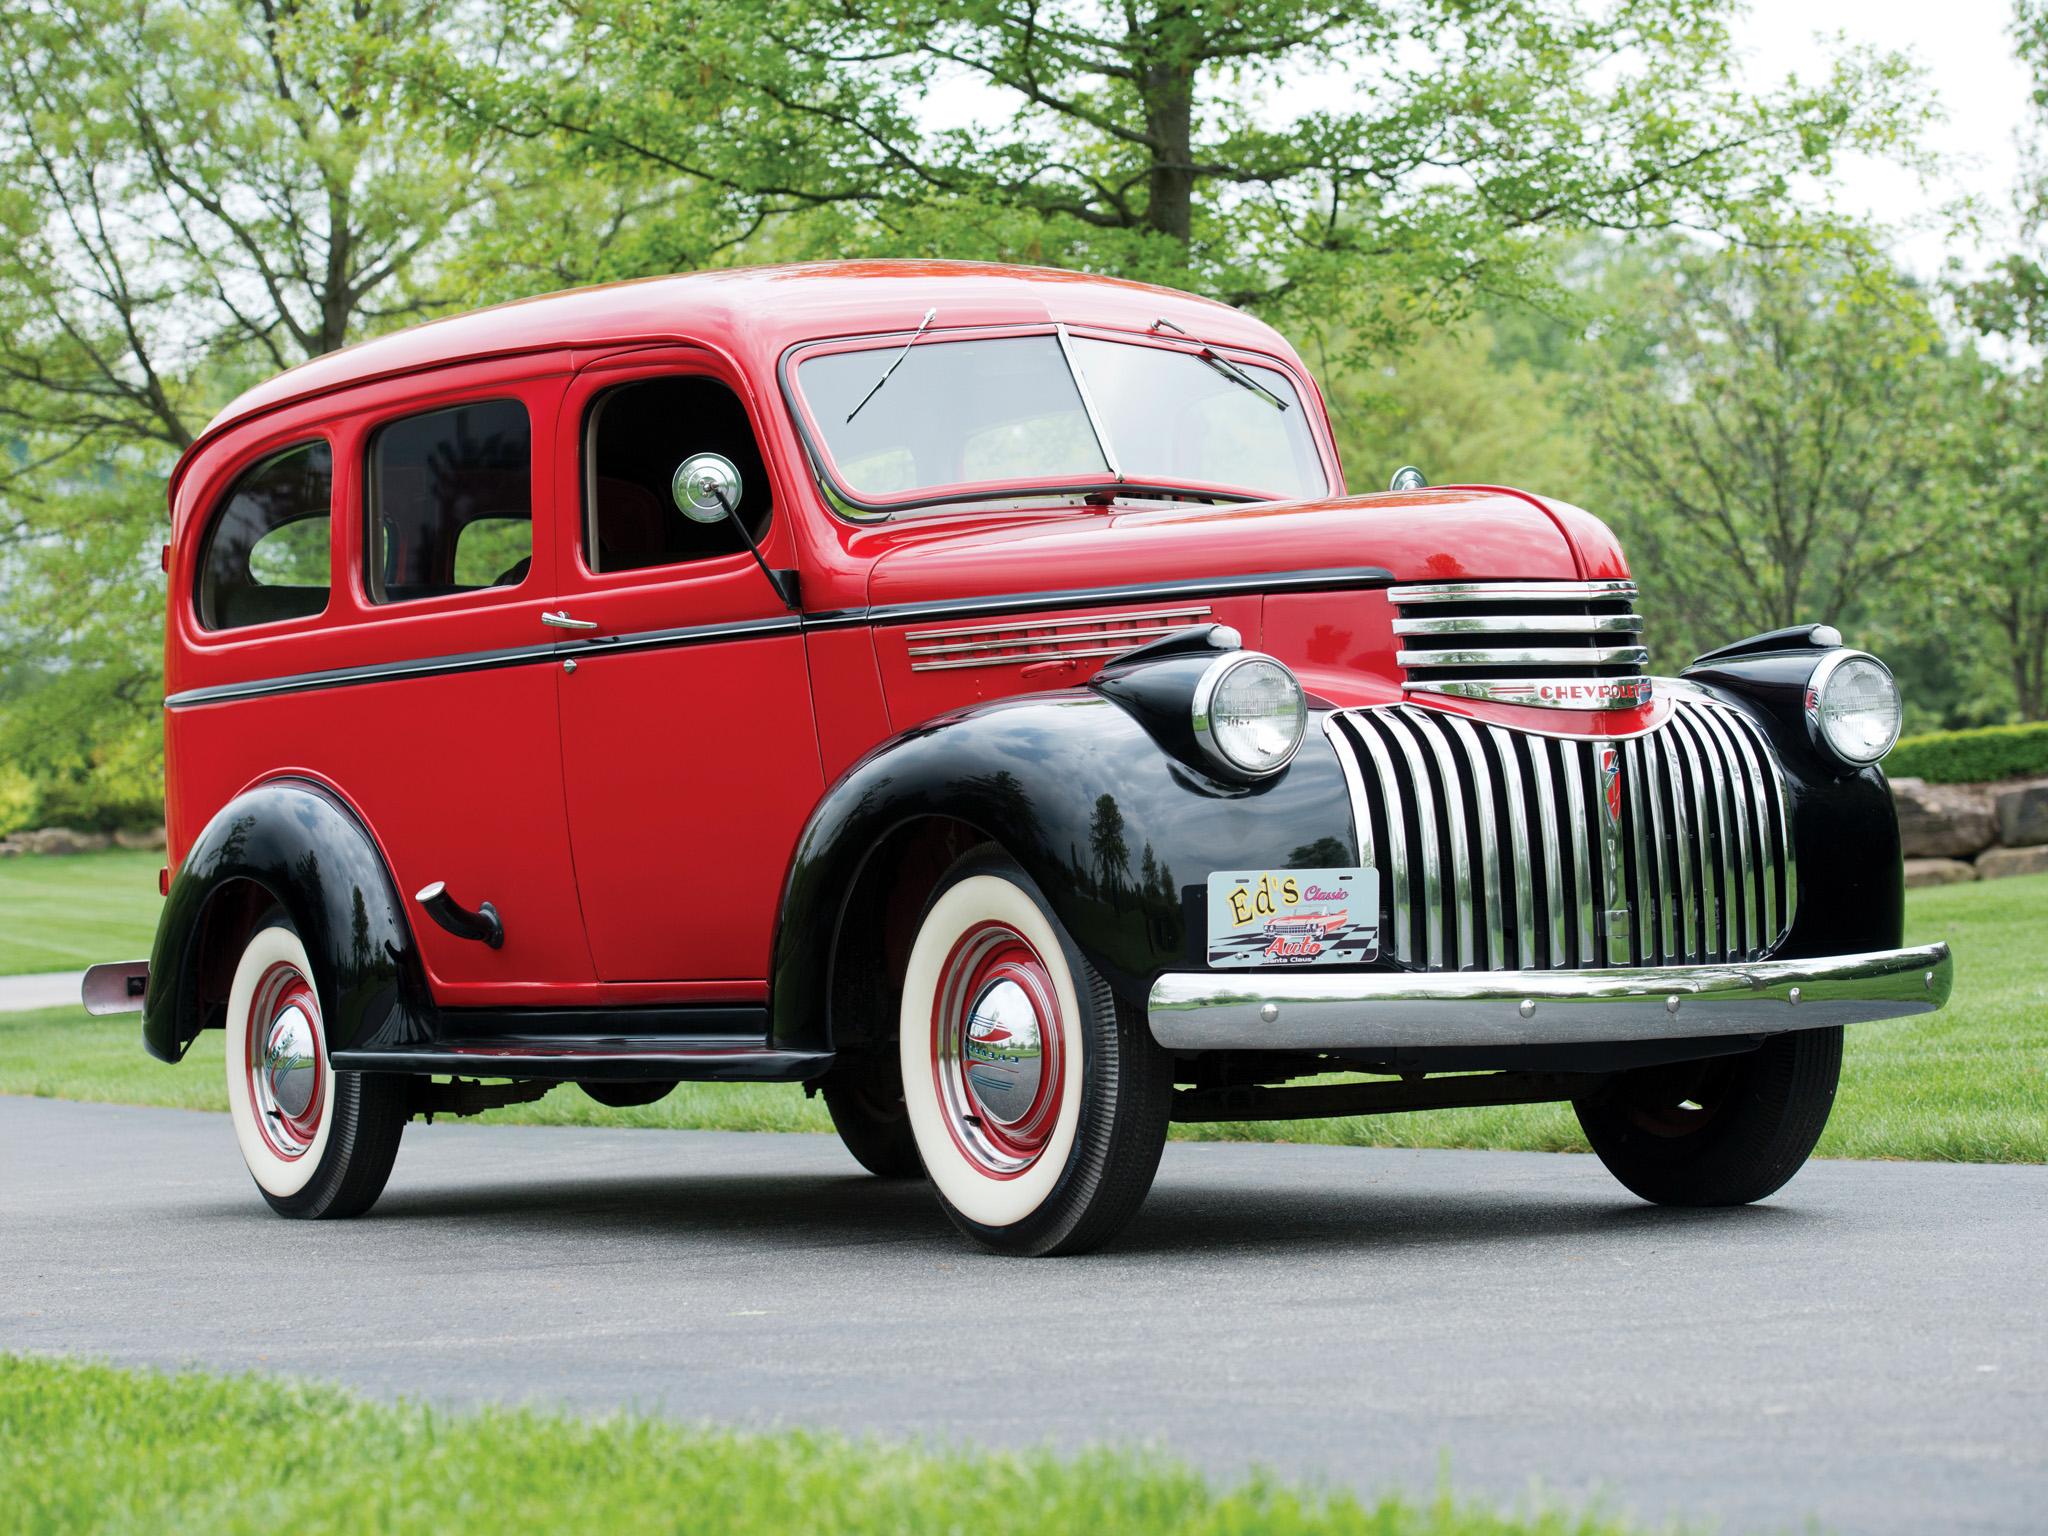 1946 Chevrolet Carryall Suburban Retro Truck G Wallpaper 2048x1536 1941 Chevy Station Wagon 115557 Wallpaperup